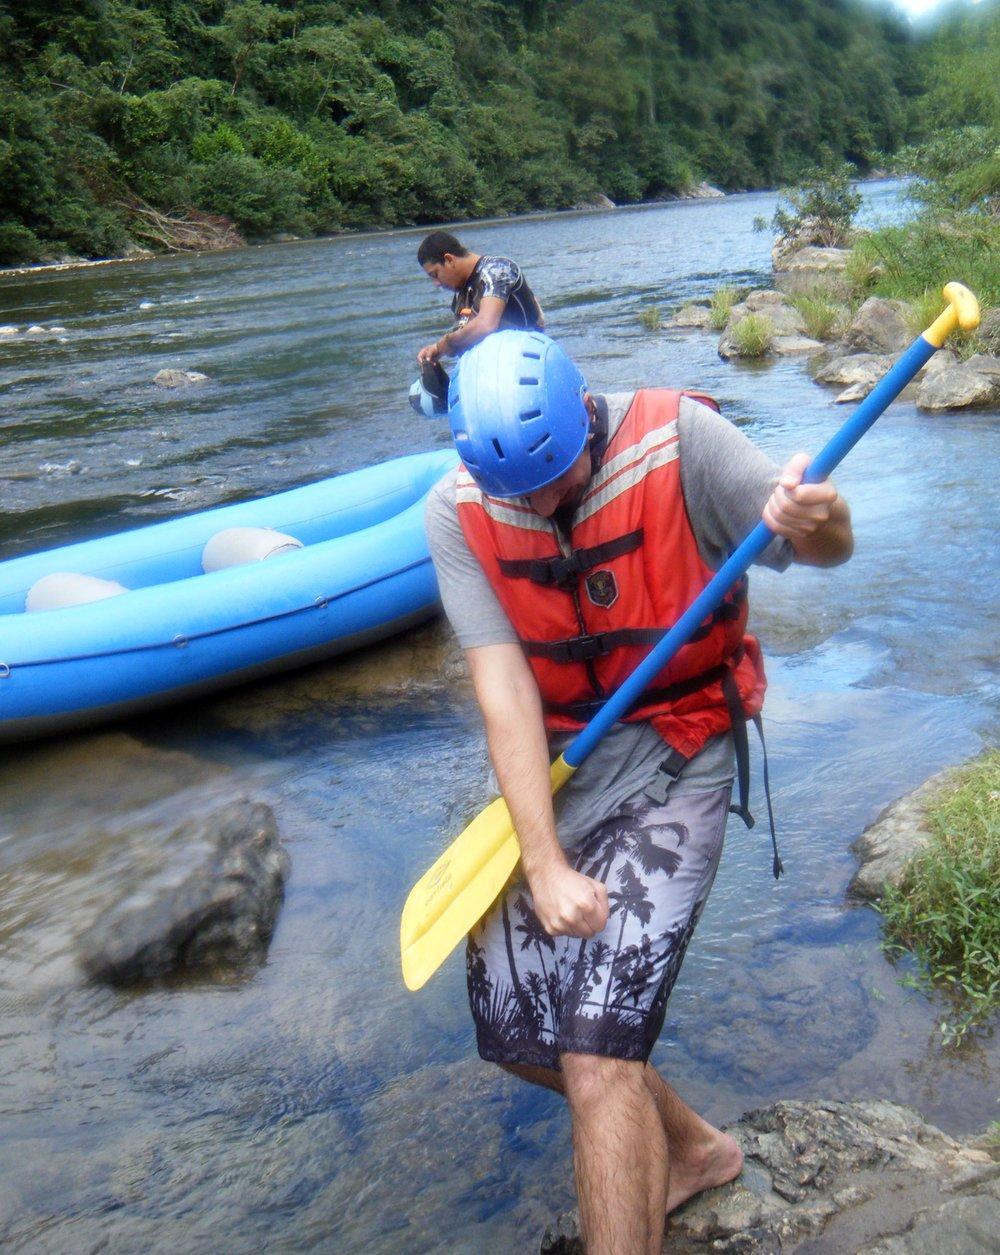 river rockout.jpg